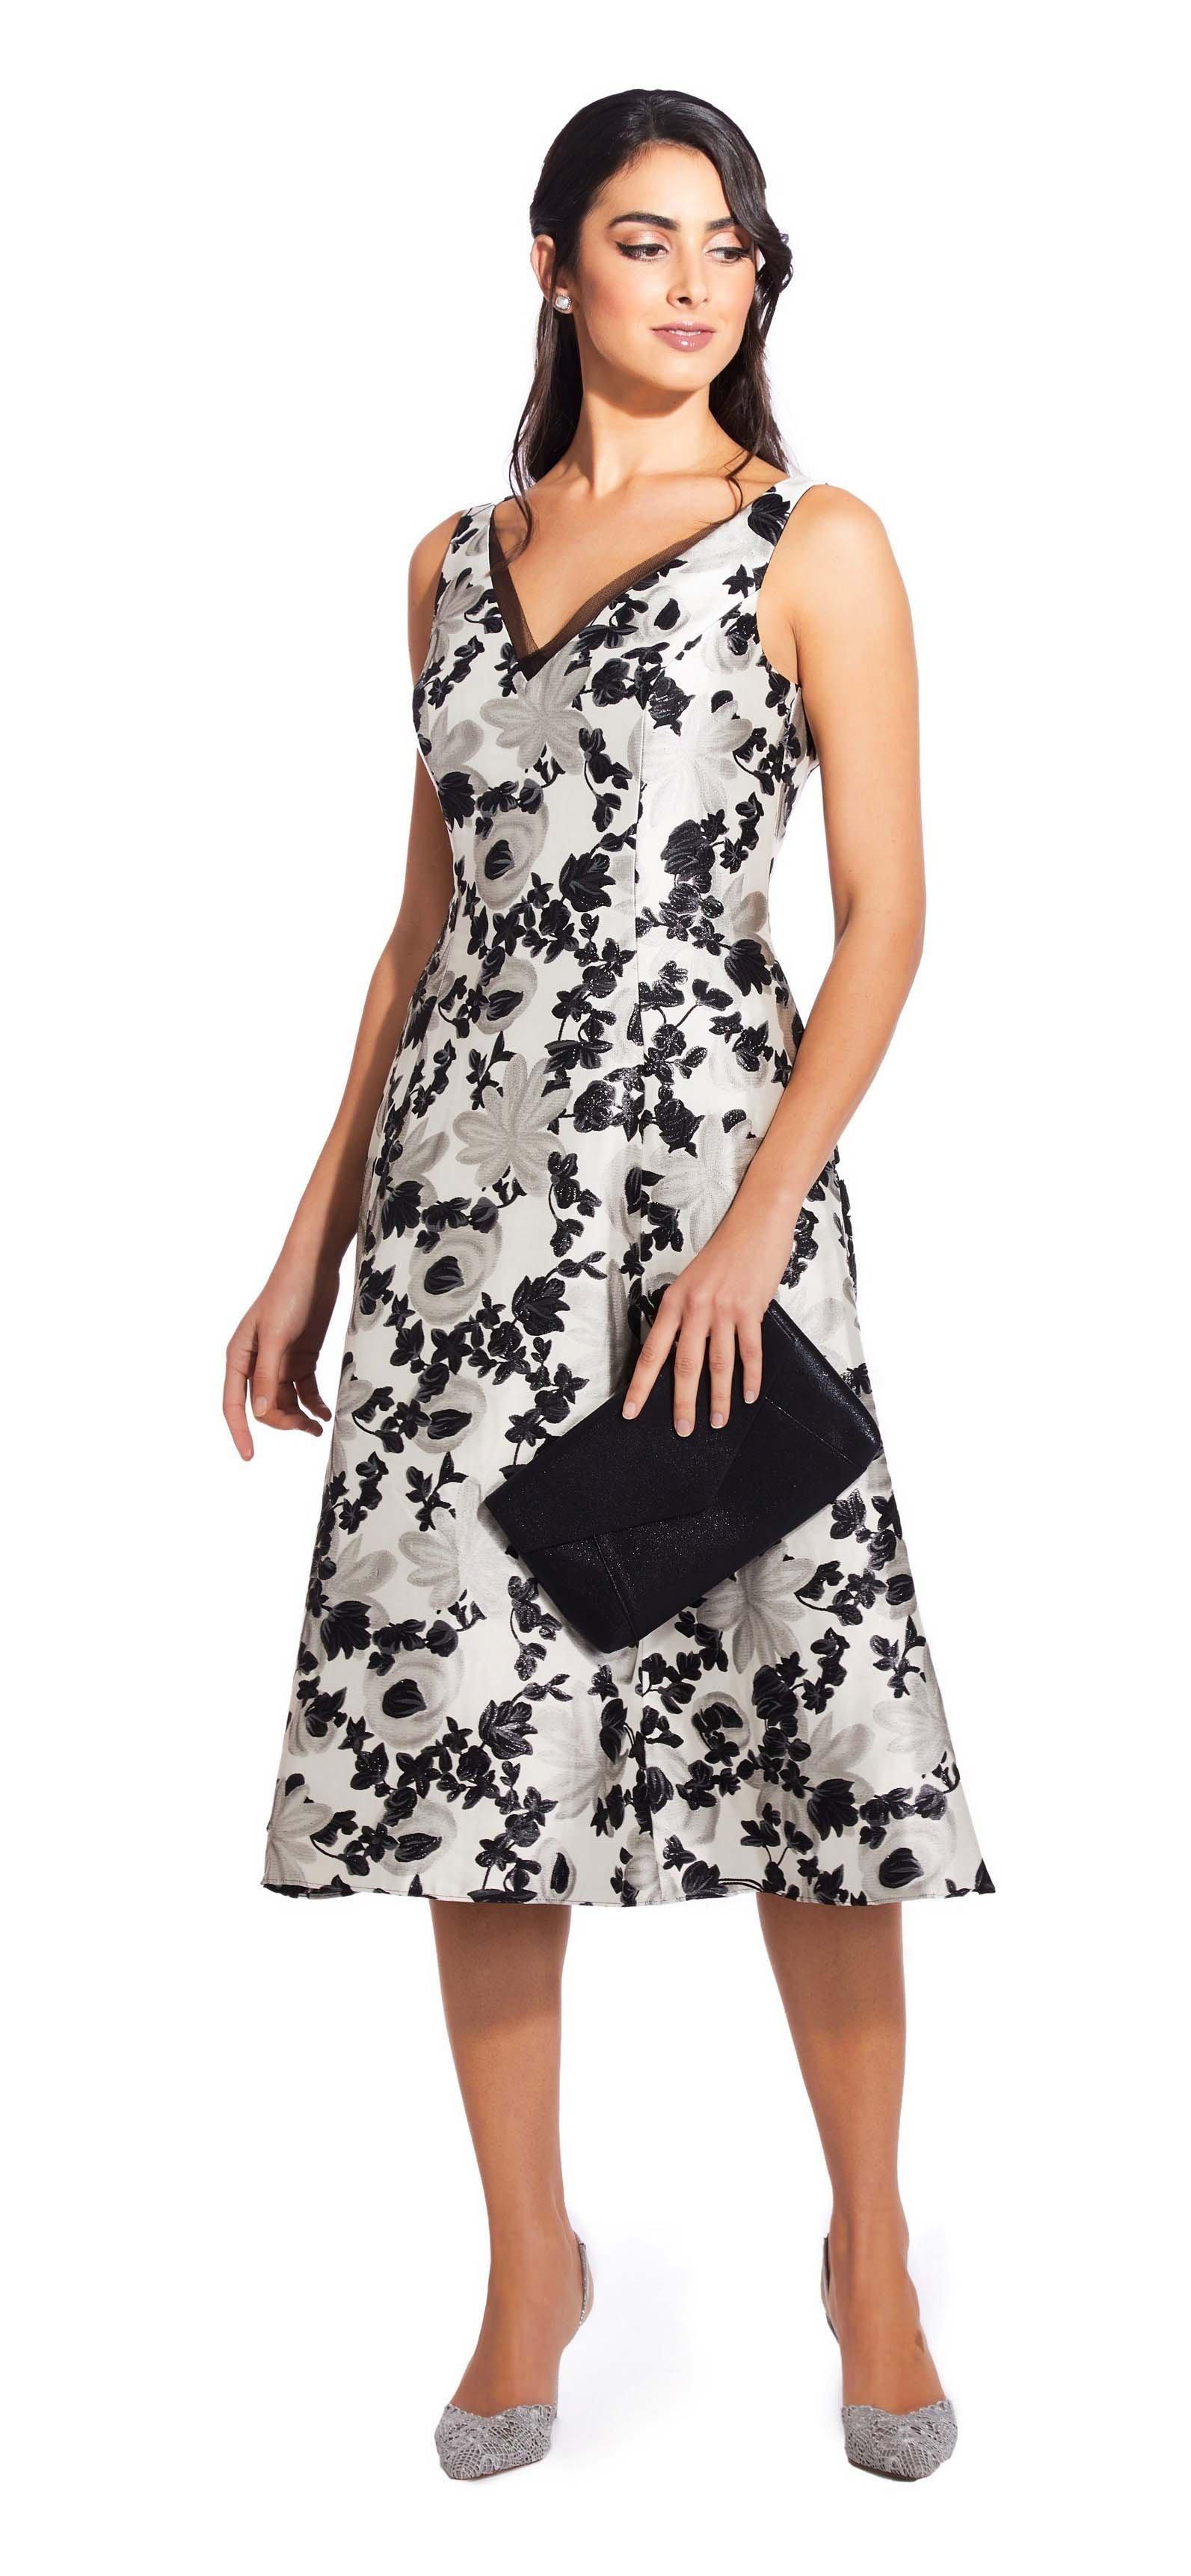 d7793f4b Adrianna Papell - Black Ap1e204997 Floral Metallic V-neck Dress - Lyst.  View fullscreen